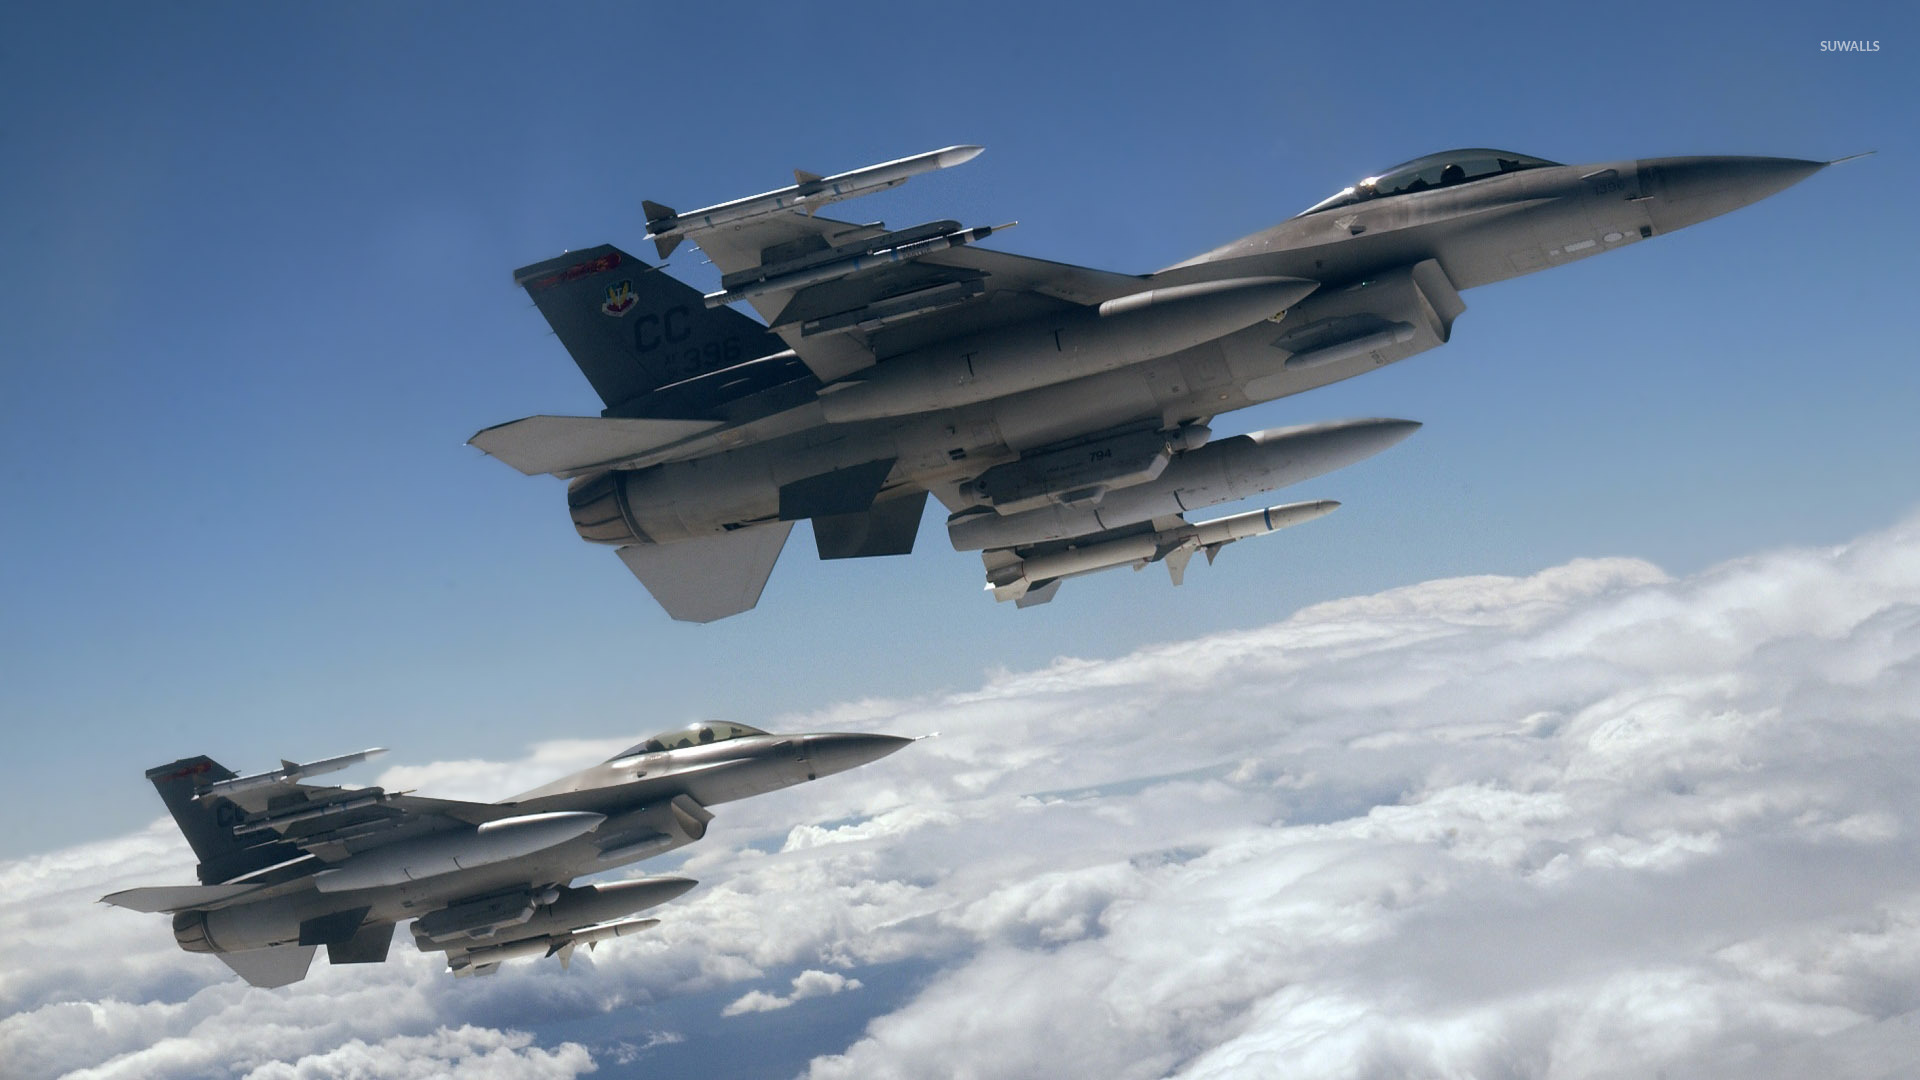 Falcon High Resolution Wallpapers: F 16 Fighting Falcon Wallpaper